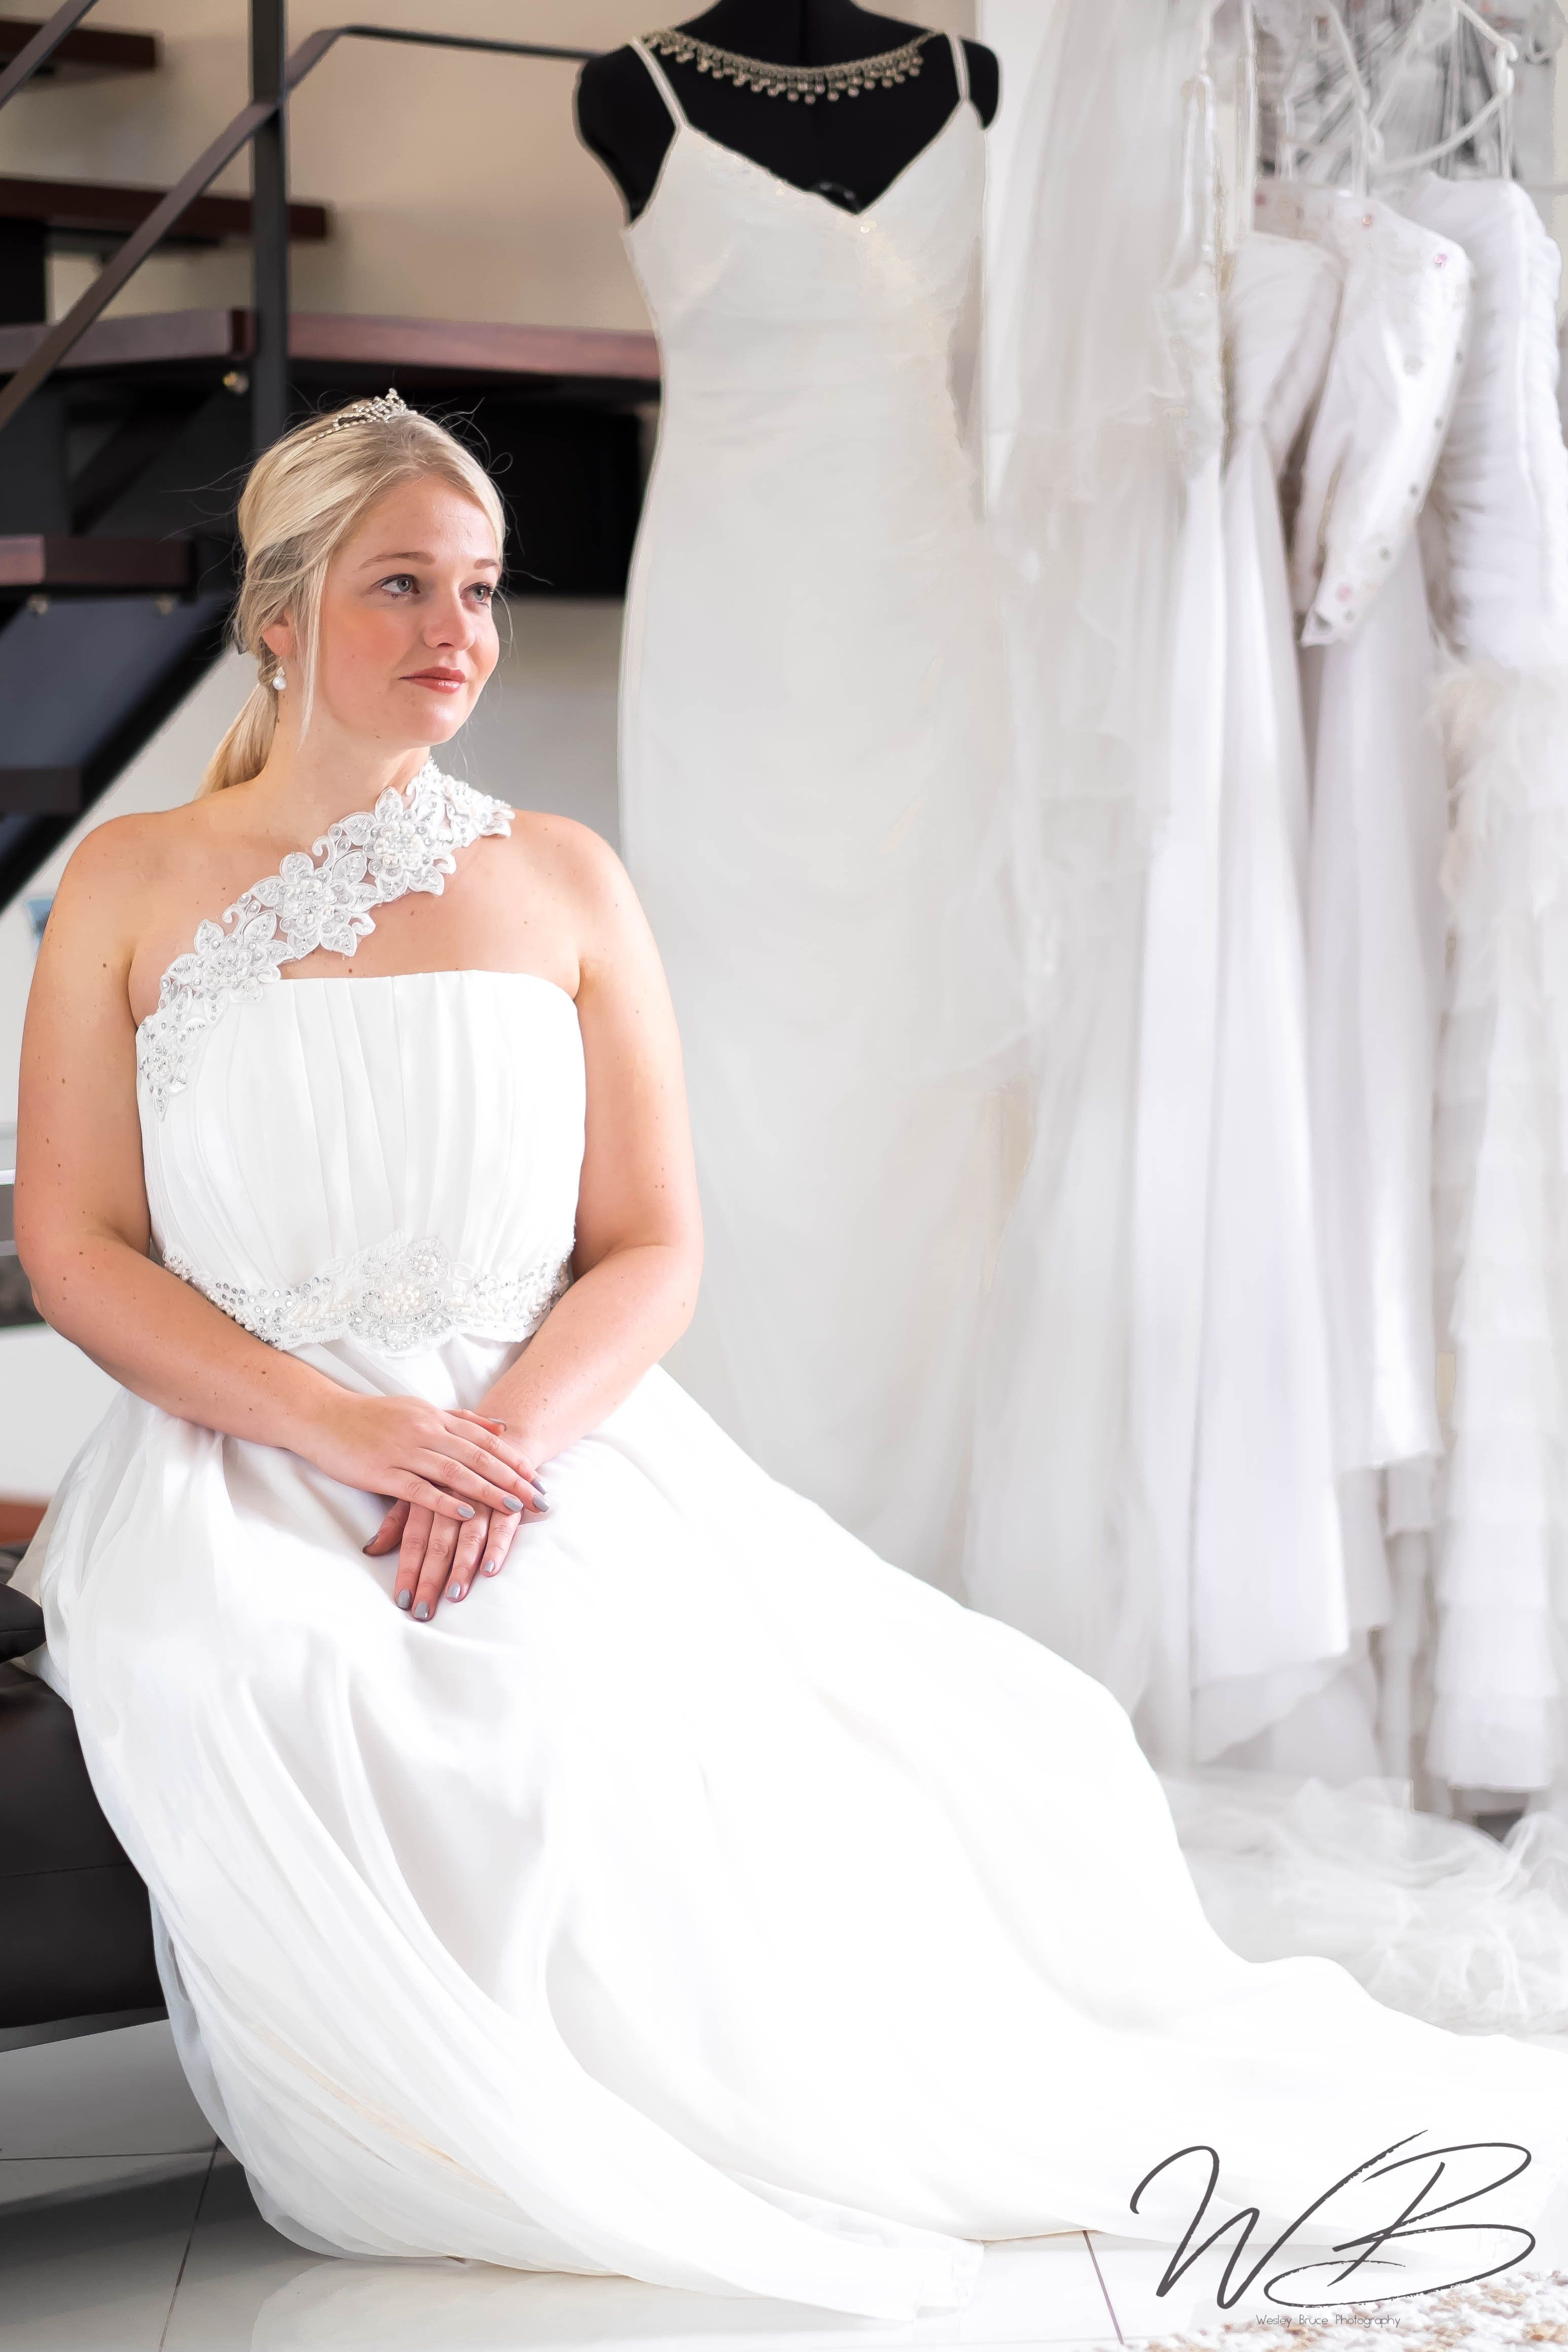 Catherine Ann's Designs based in Port Elizabeth,